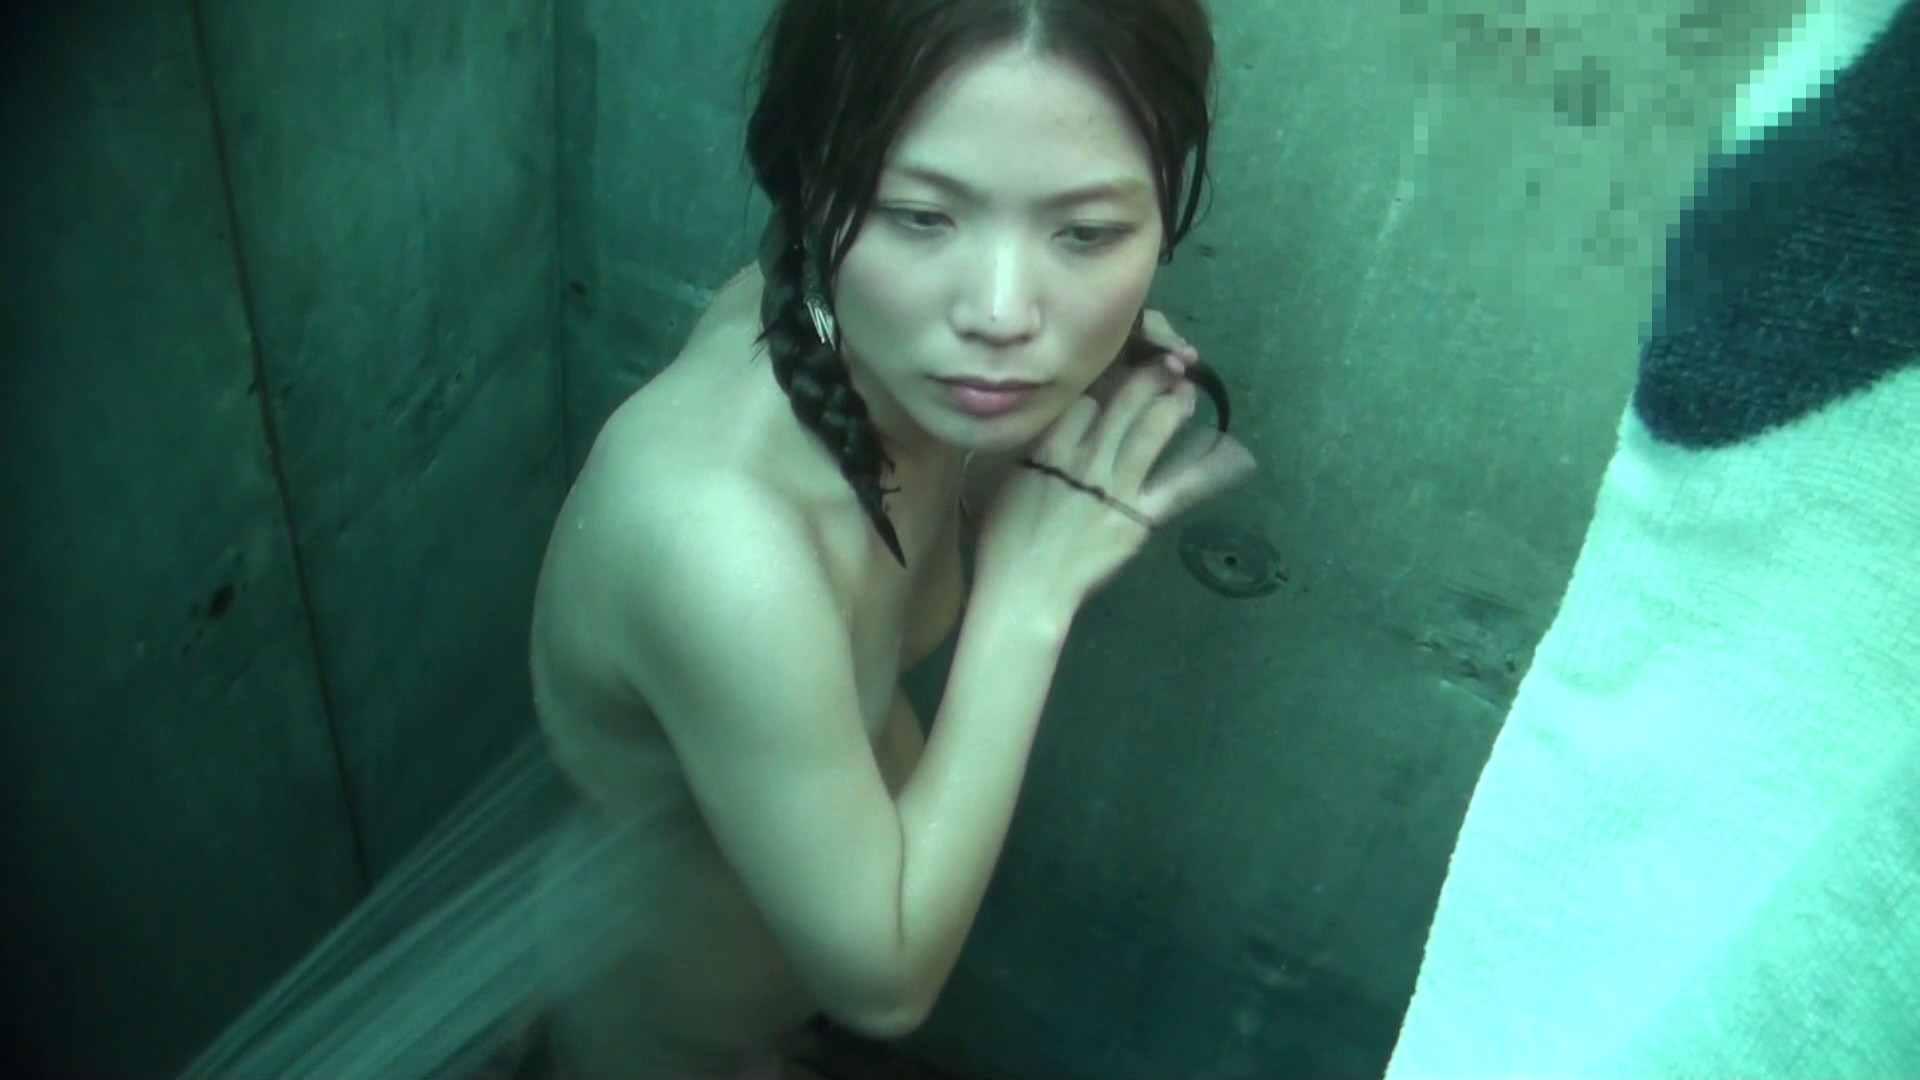 Vol.12 女性の性器には予想外の砂が混入しているようです。 シャワー すけべAV動画紹介 111枚 62